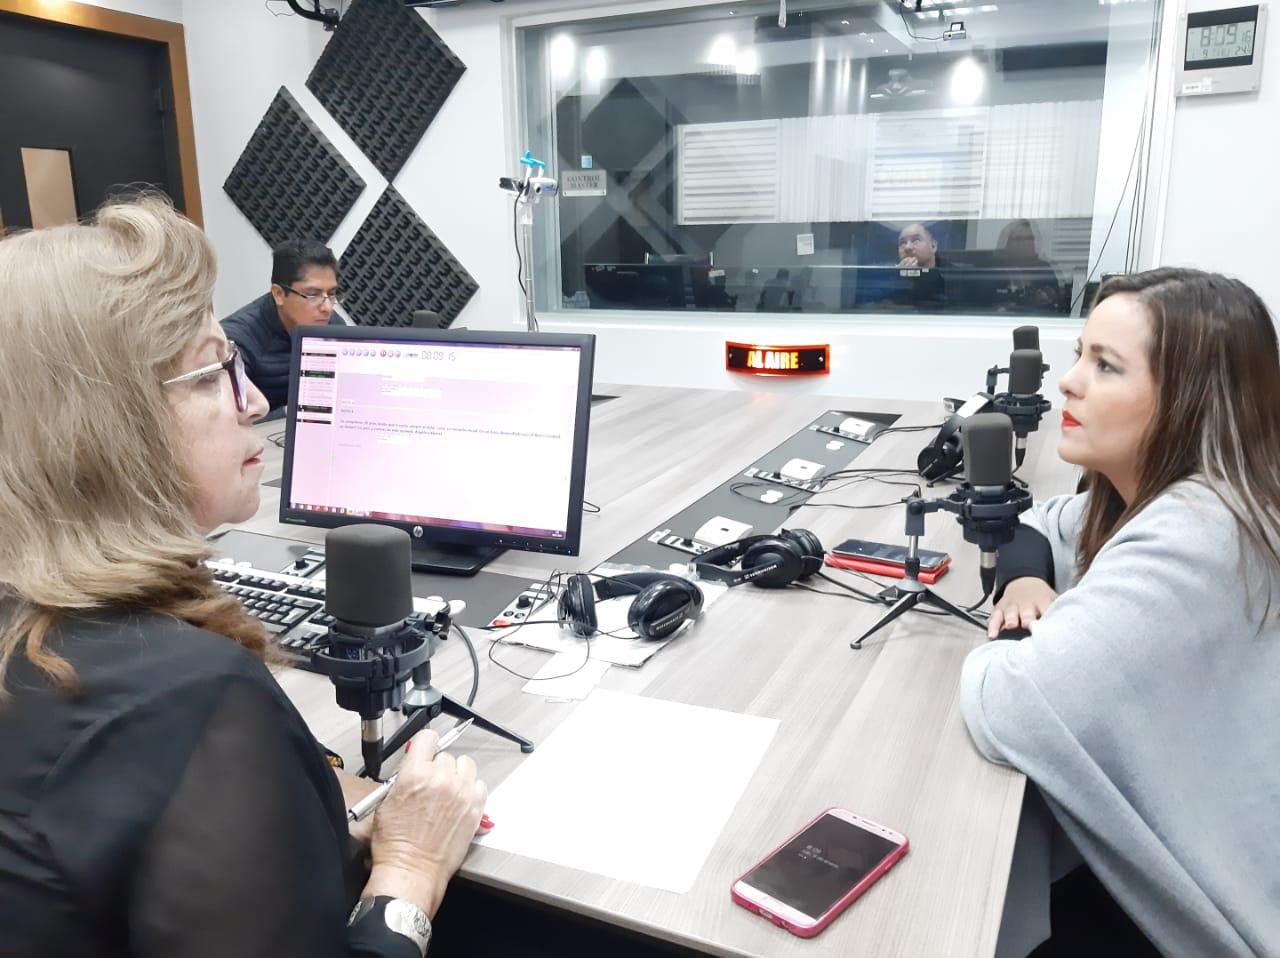 Johana Cedeño: Juicio político a Presidenta del CNE